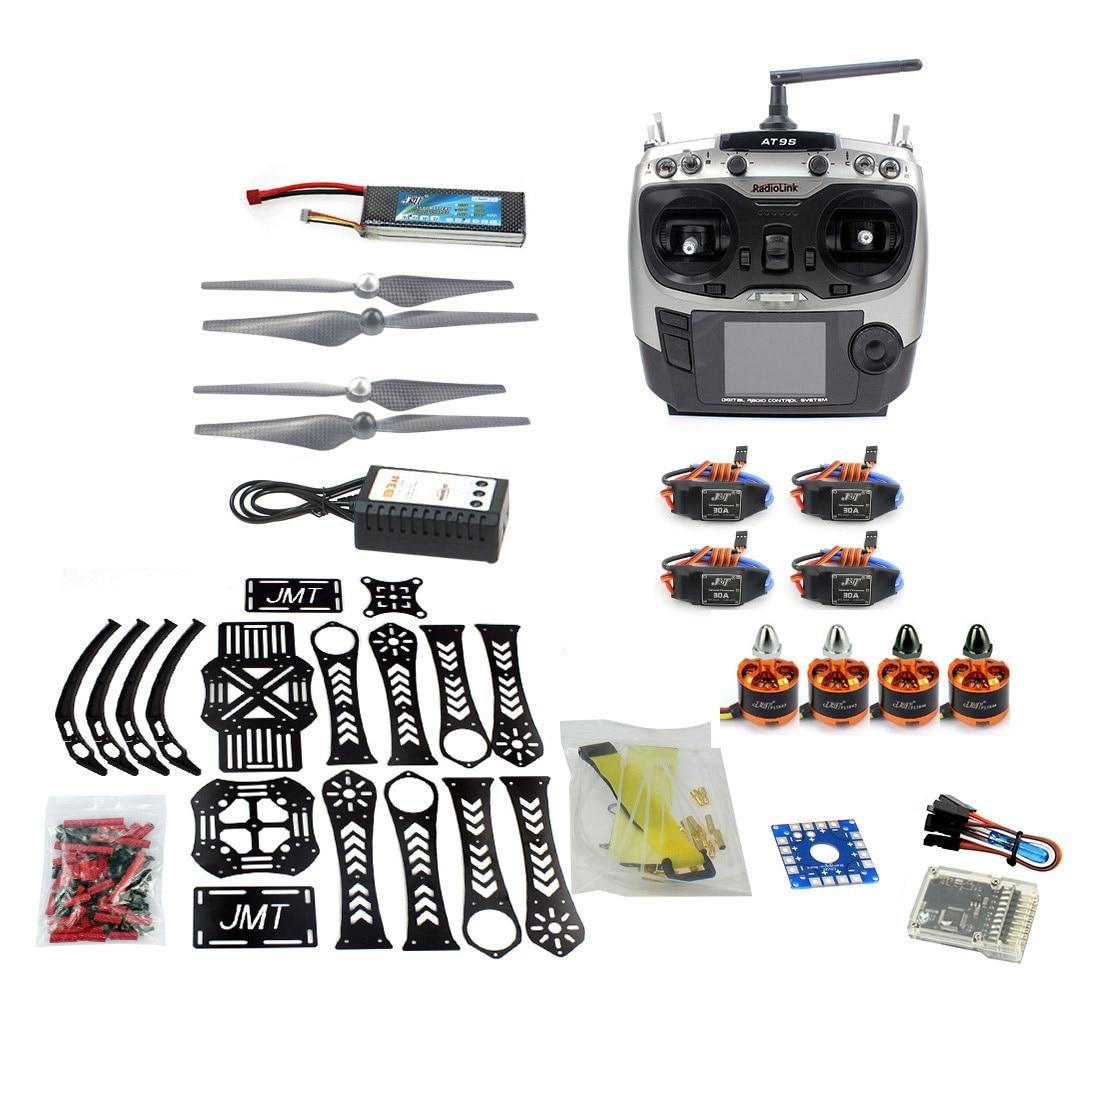 Bricolage RC Drone Quadrocopter RTF X4M360L cadre Kit QQ Super Radiolink AT9S F14892-H